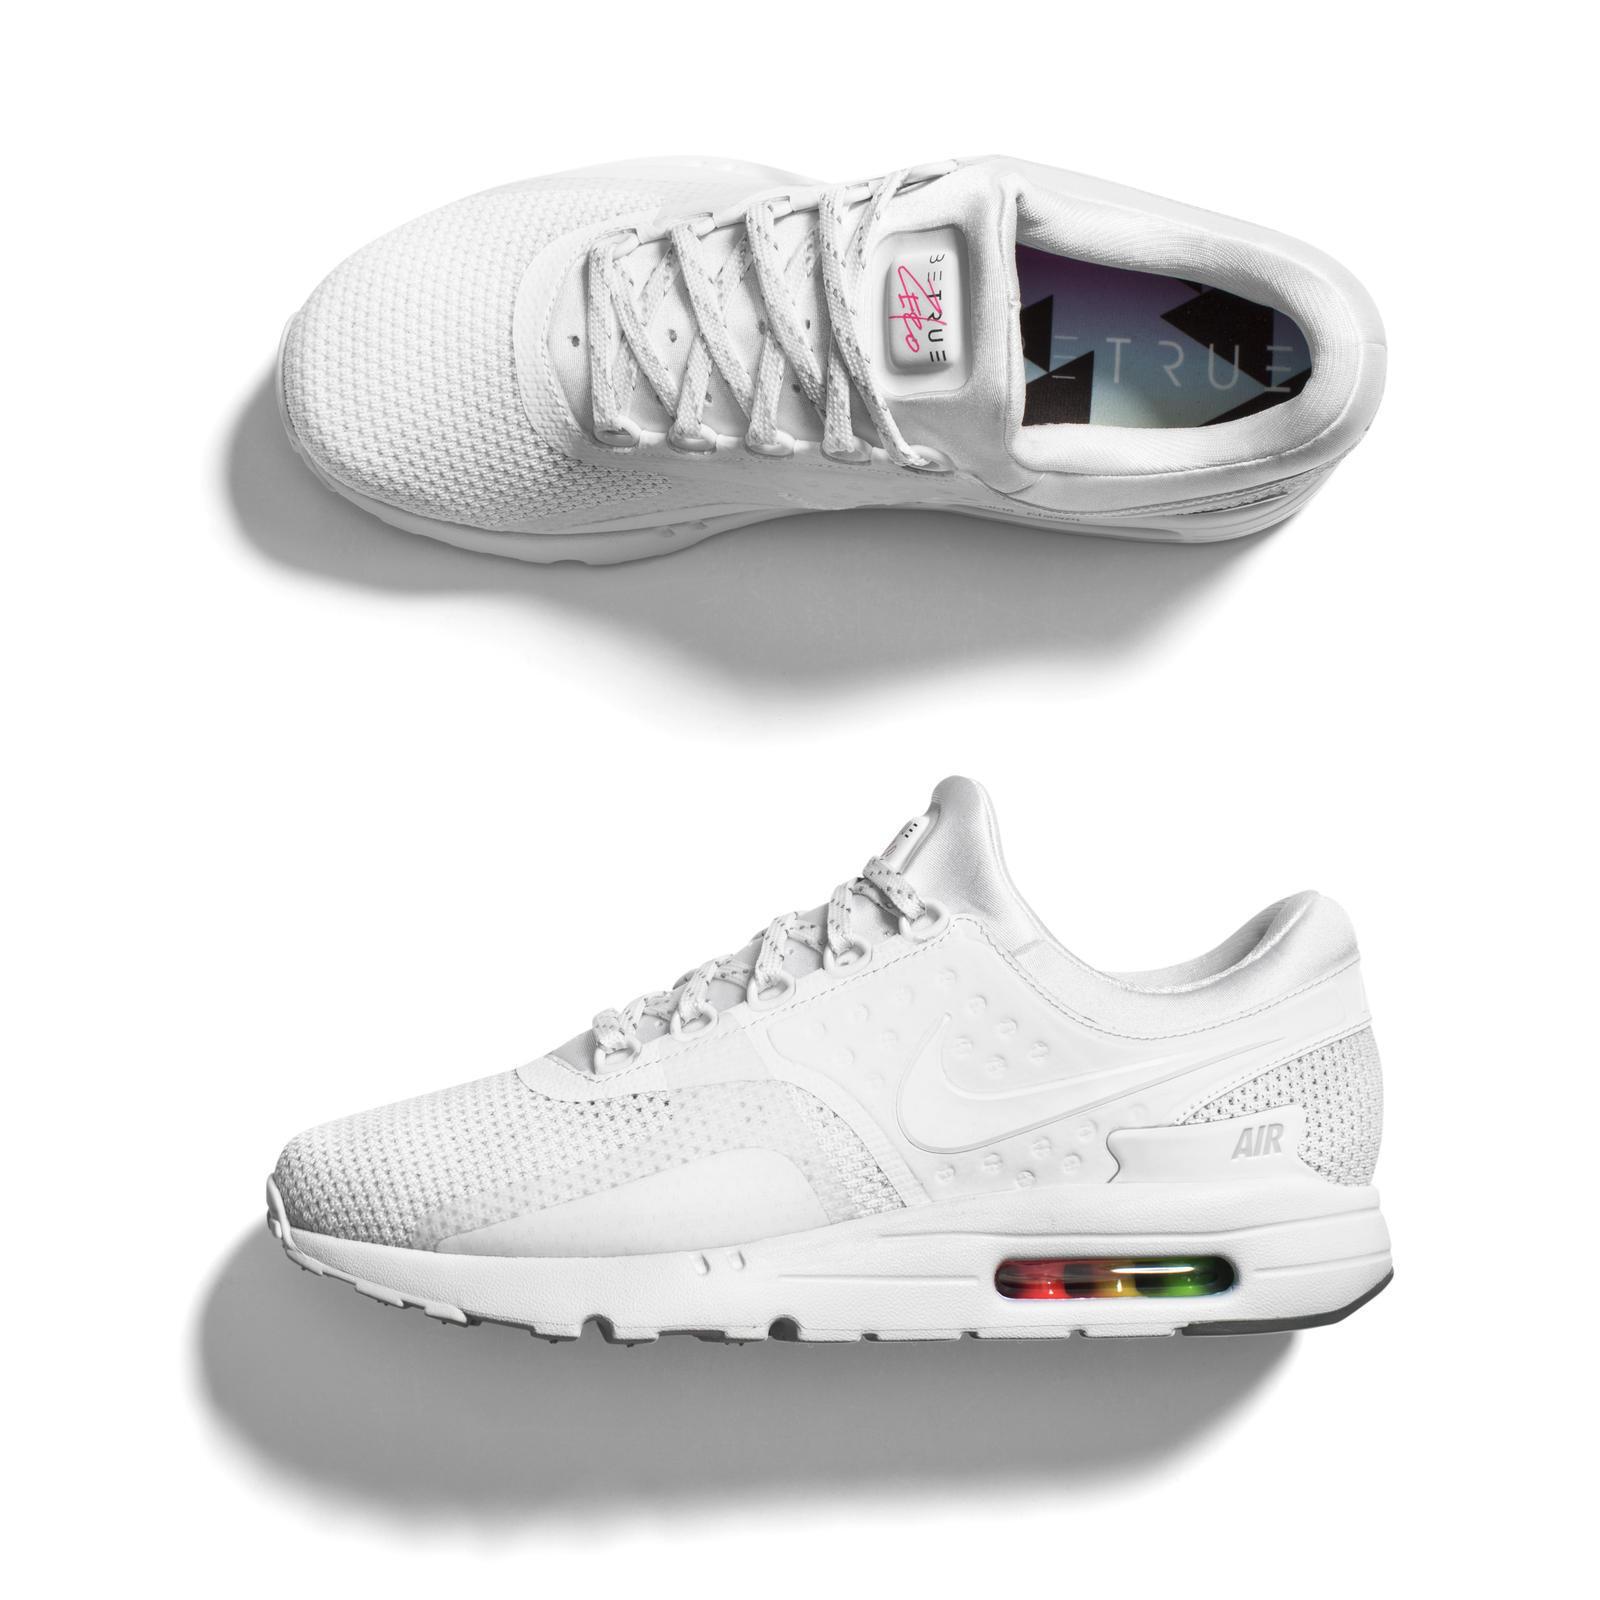 Nike 789695-101 AIR MAX Zero è True Uomo Bianco 789695-101 Nike (tutte le dimensioni) QS LIMITED 95 Ultra e51c2c